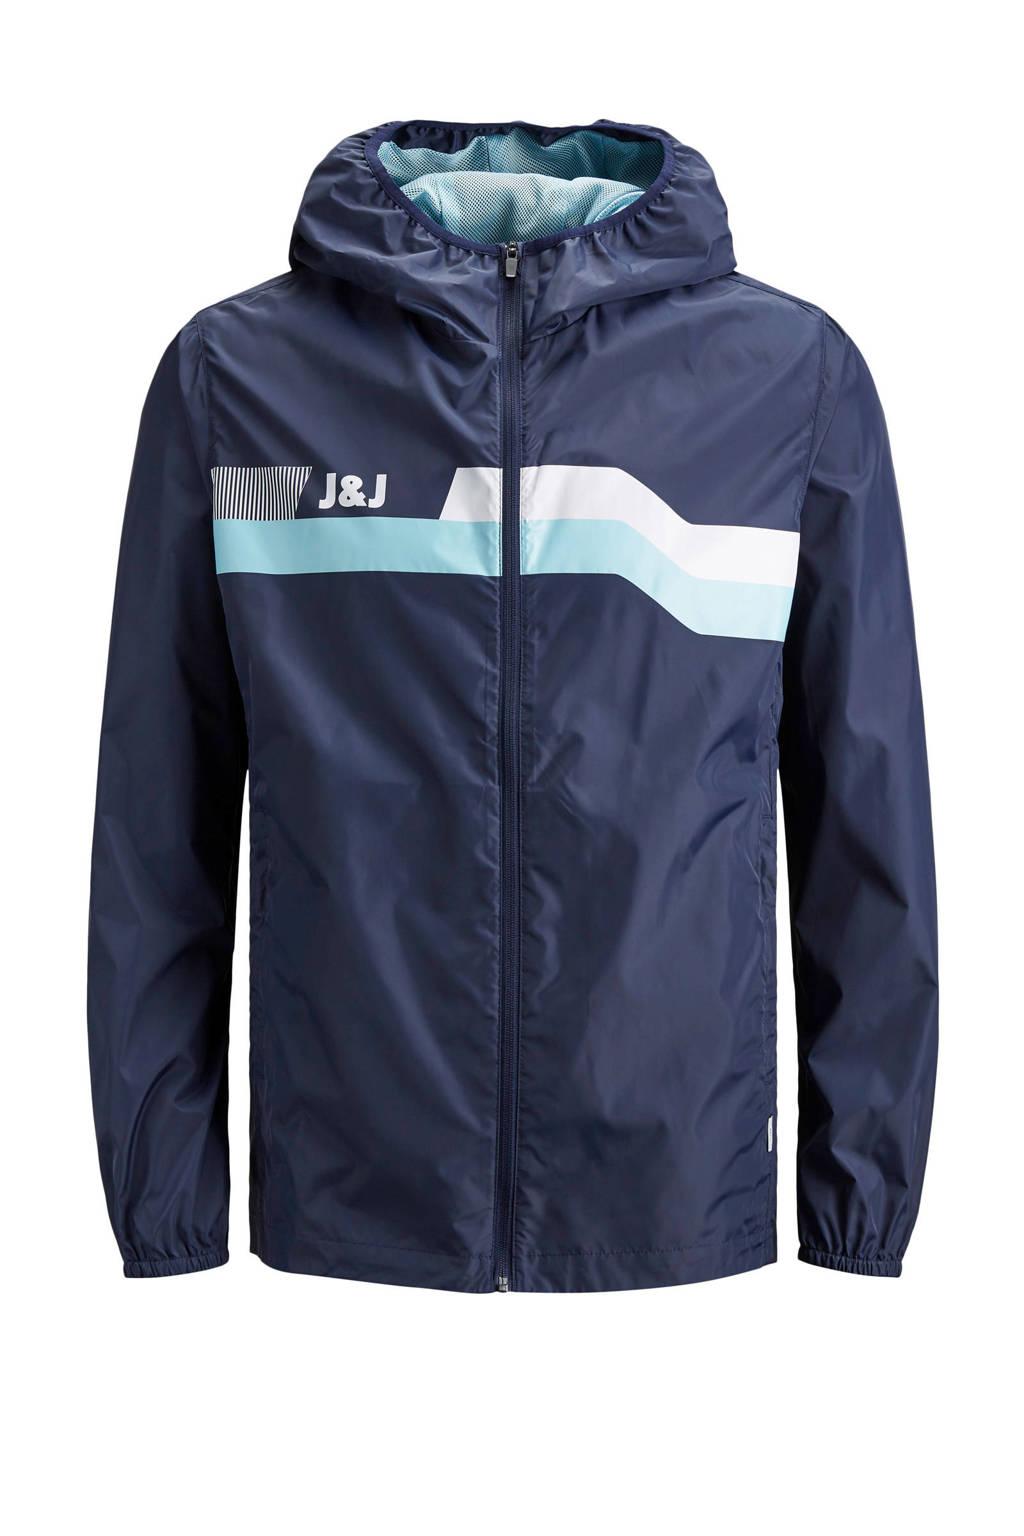 Jack & Jones Intelligence regenjas, Blauw/wit